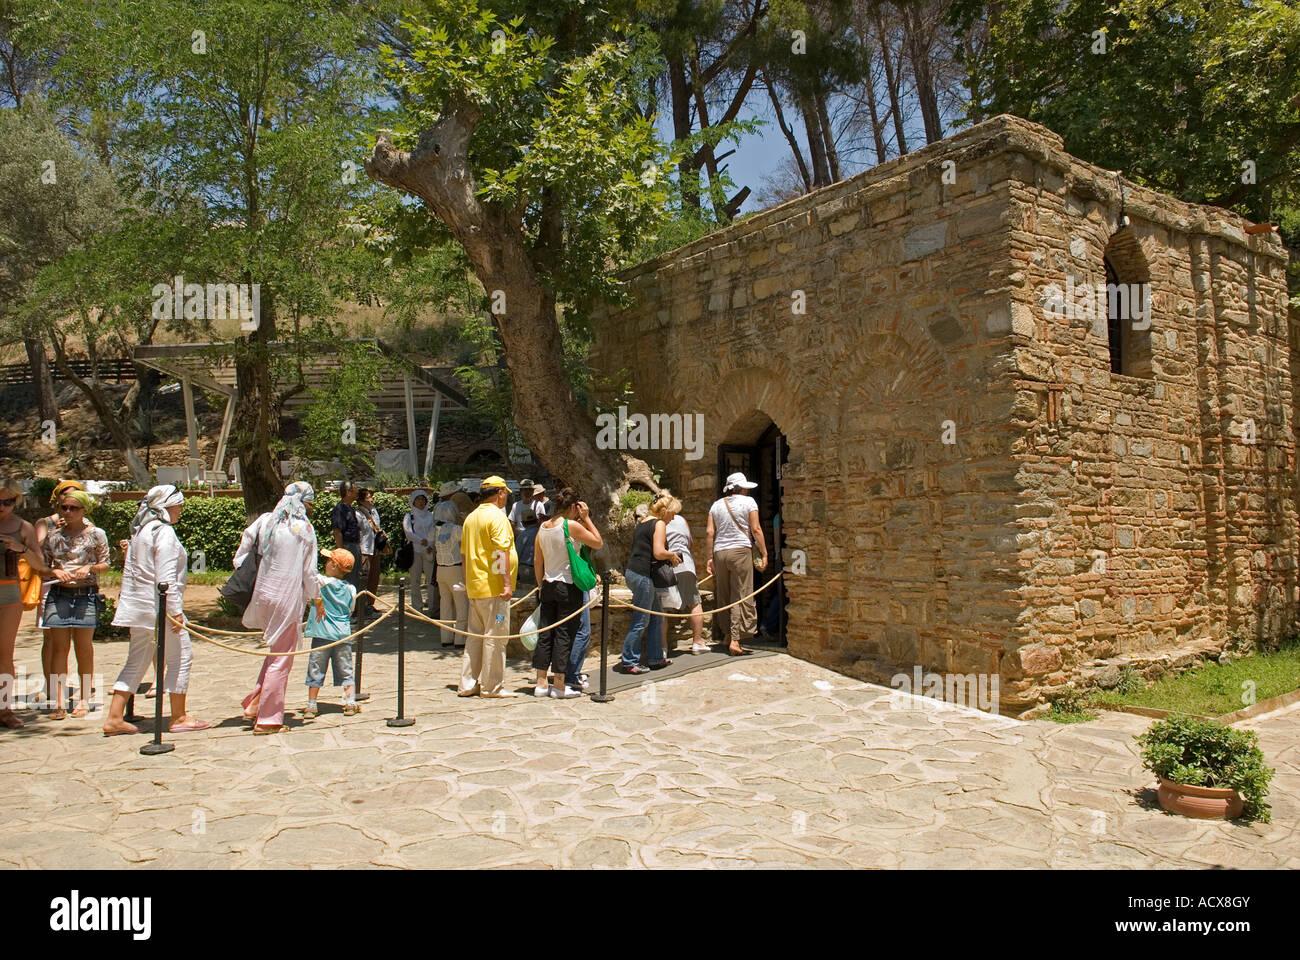 Tourists in pilgrimage to House of St. Mary, Meryem Ana Evi, Izmir Turkey. - Stock Image